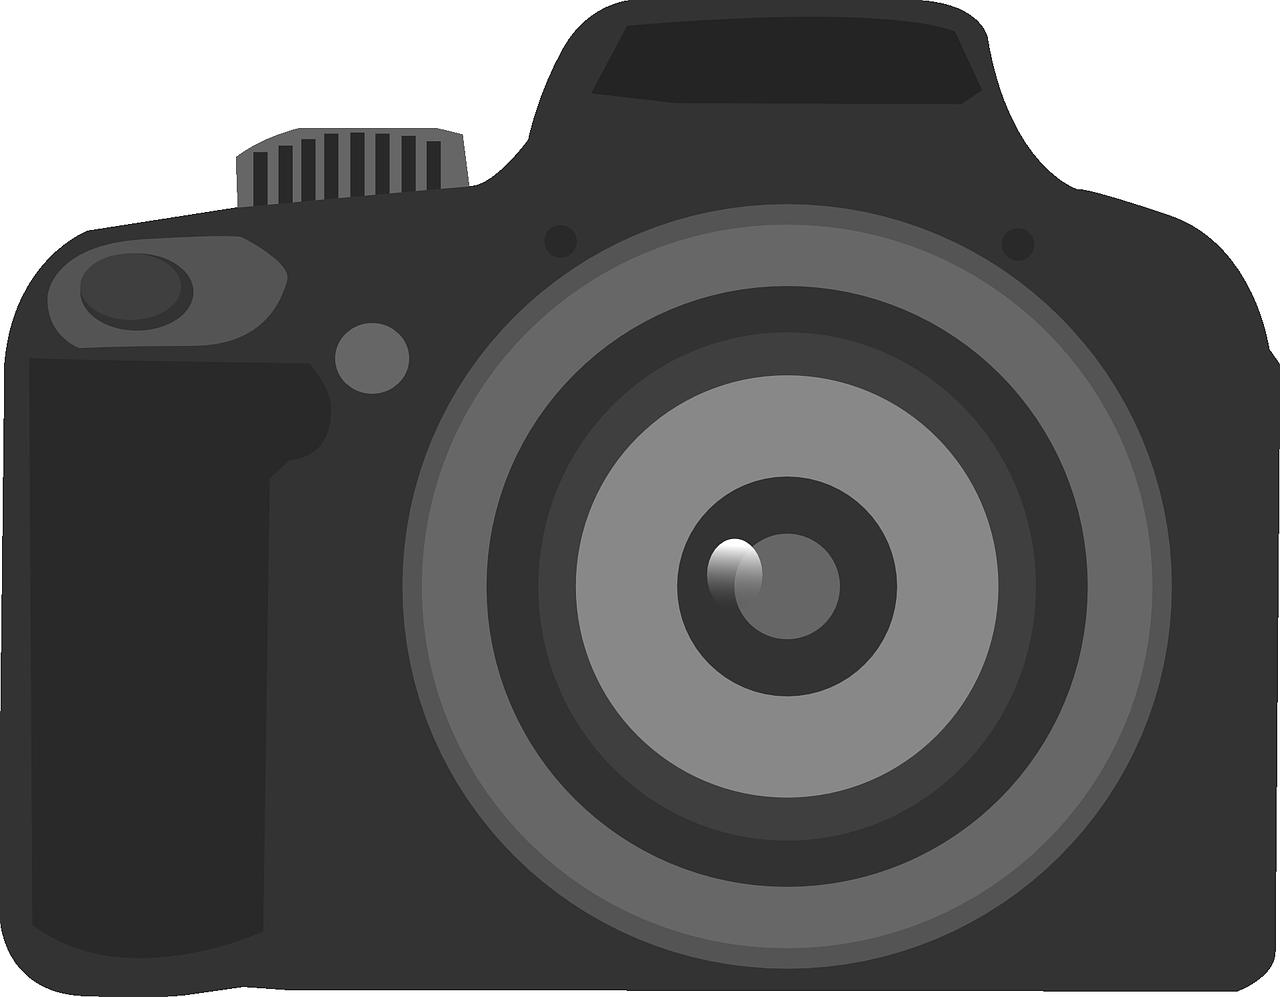 HD Camera Digital Camera Photography.